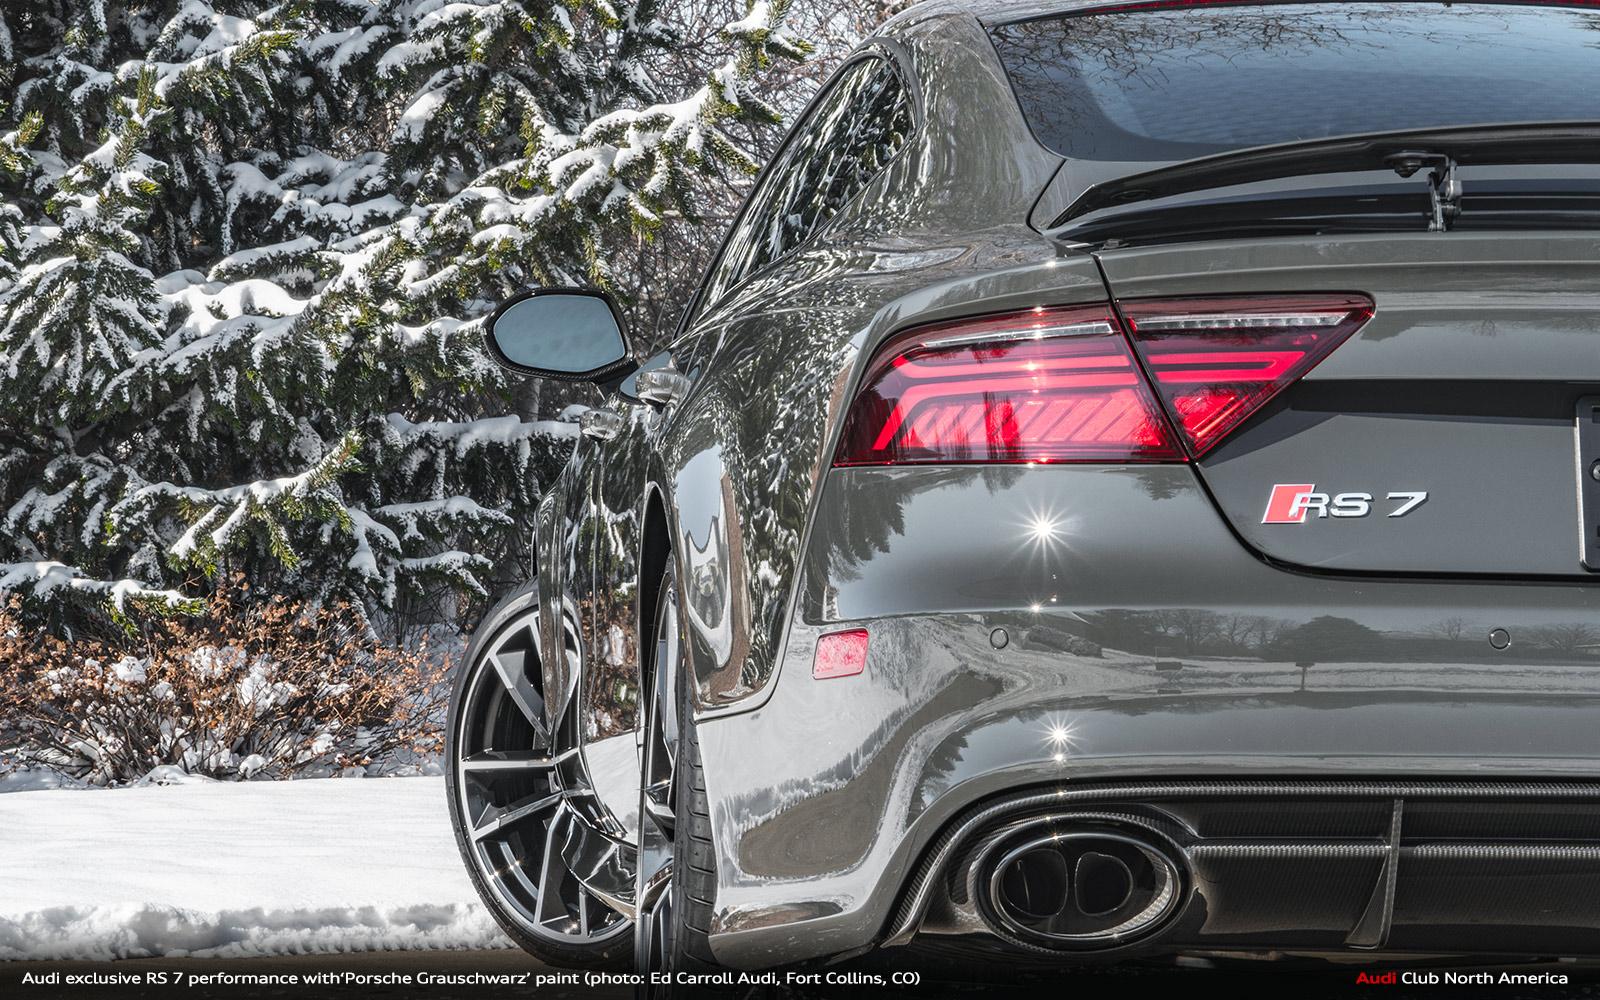 Ed Carroll Audi >> Audi-RS7-performance-exclusive-Porsche-GrauSchwarz-289 - Audi Club North America